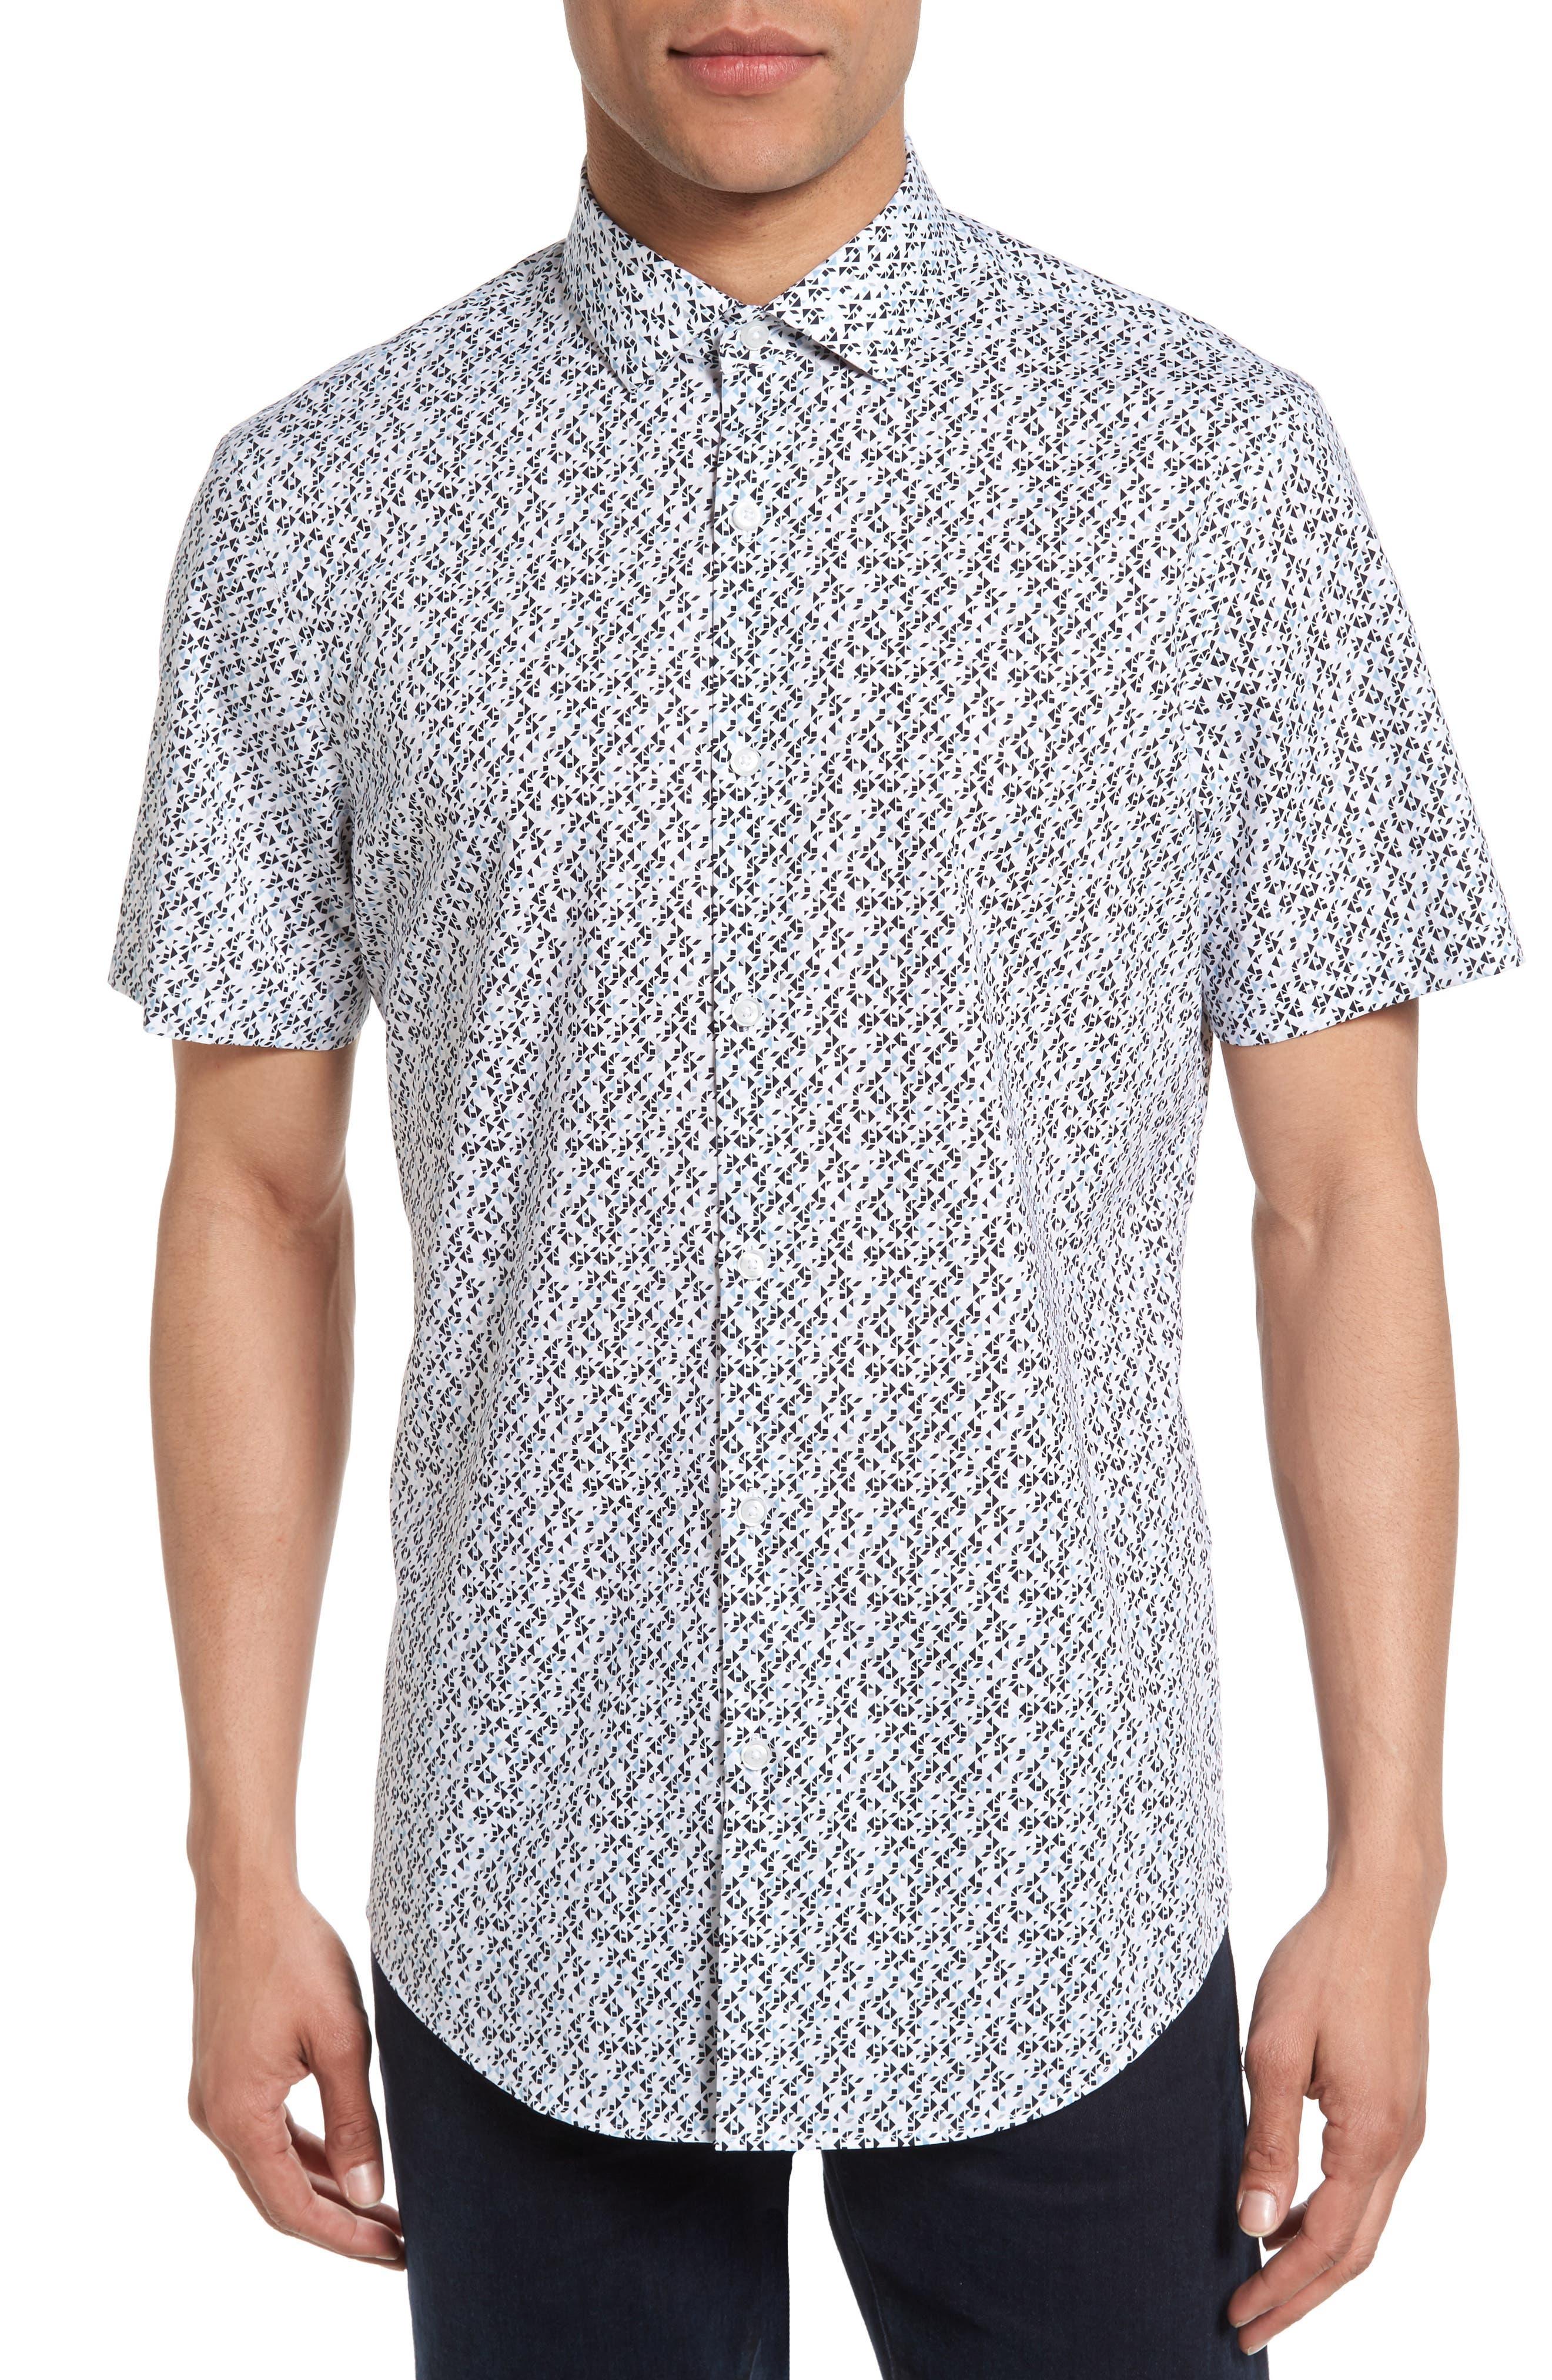 No-Iron Geo Print Woven Shirt,                         Main,                         color, Grey Lunar White Triangle Geo